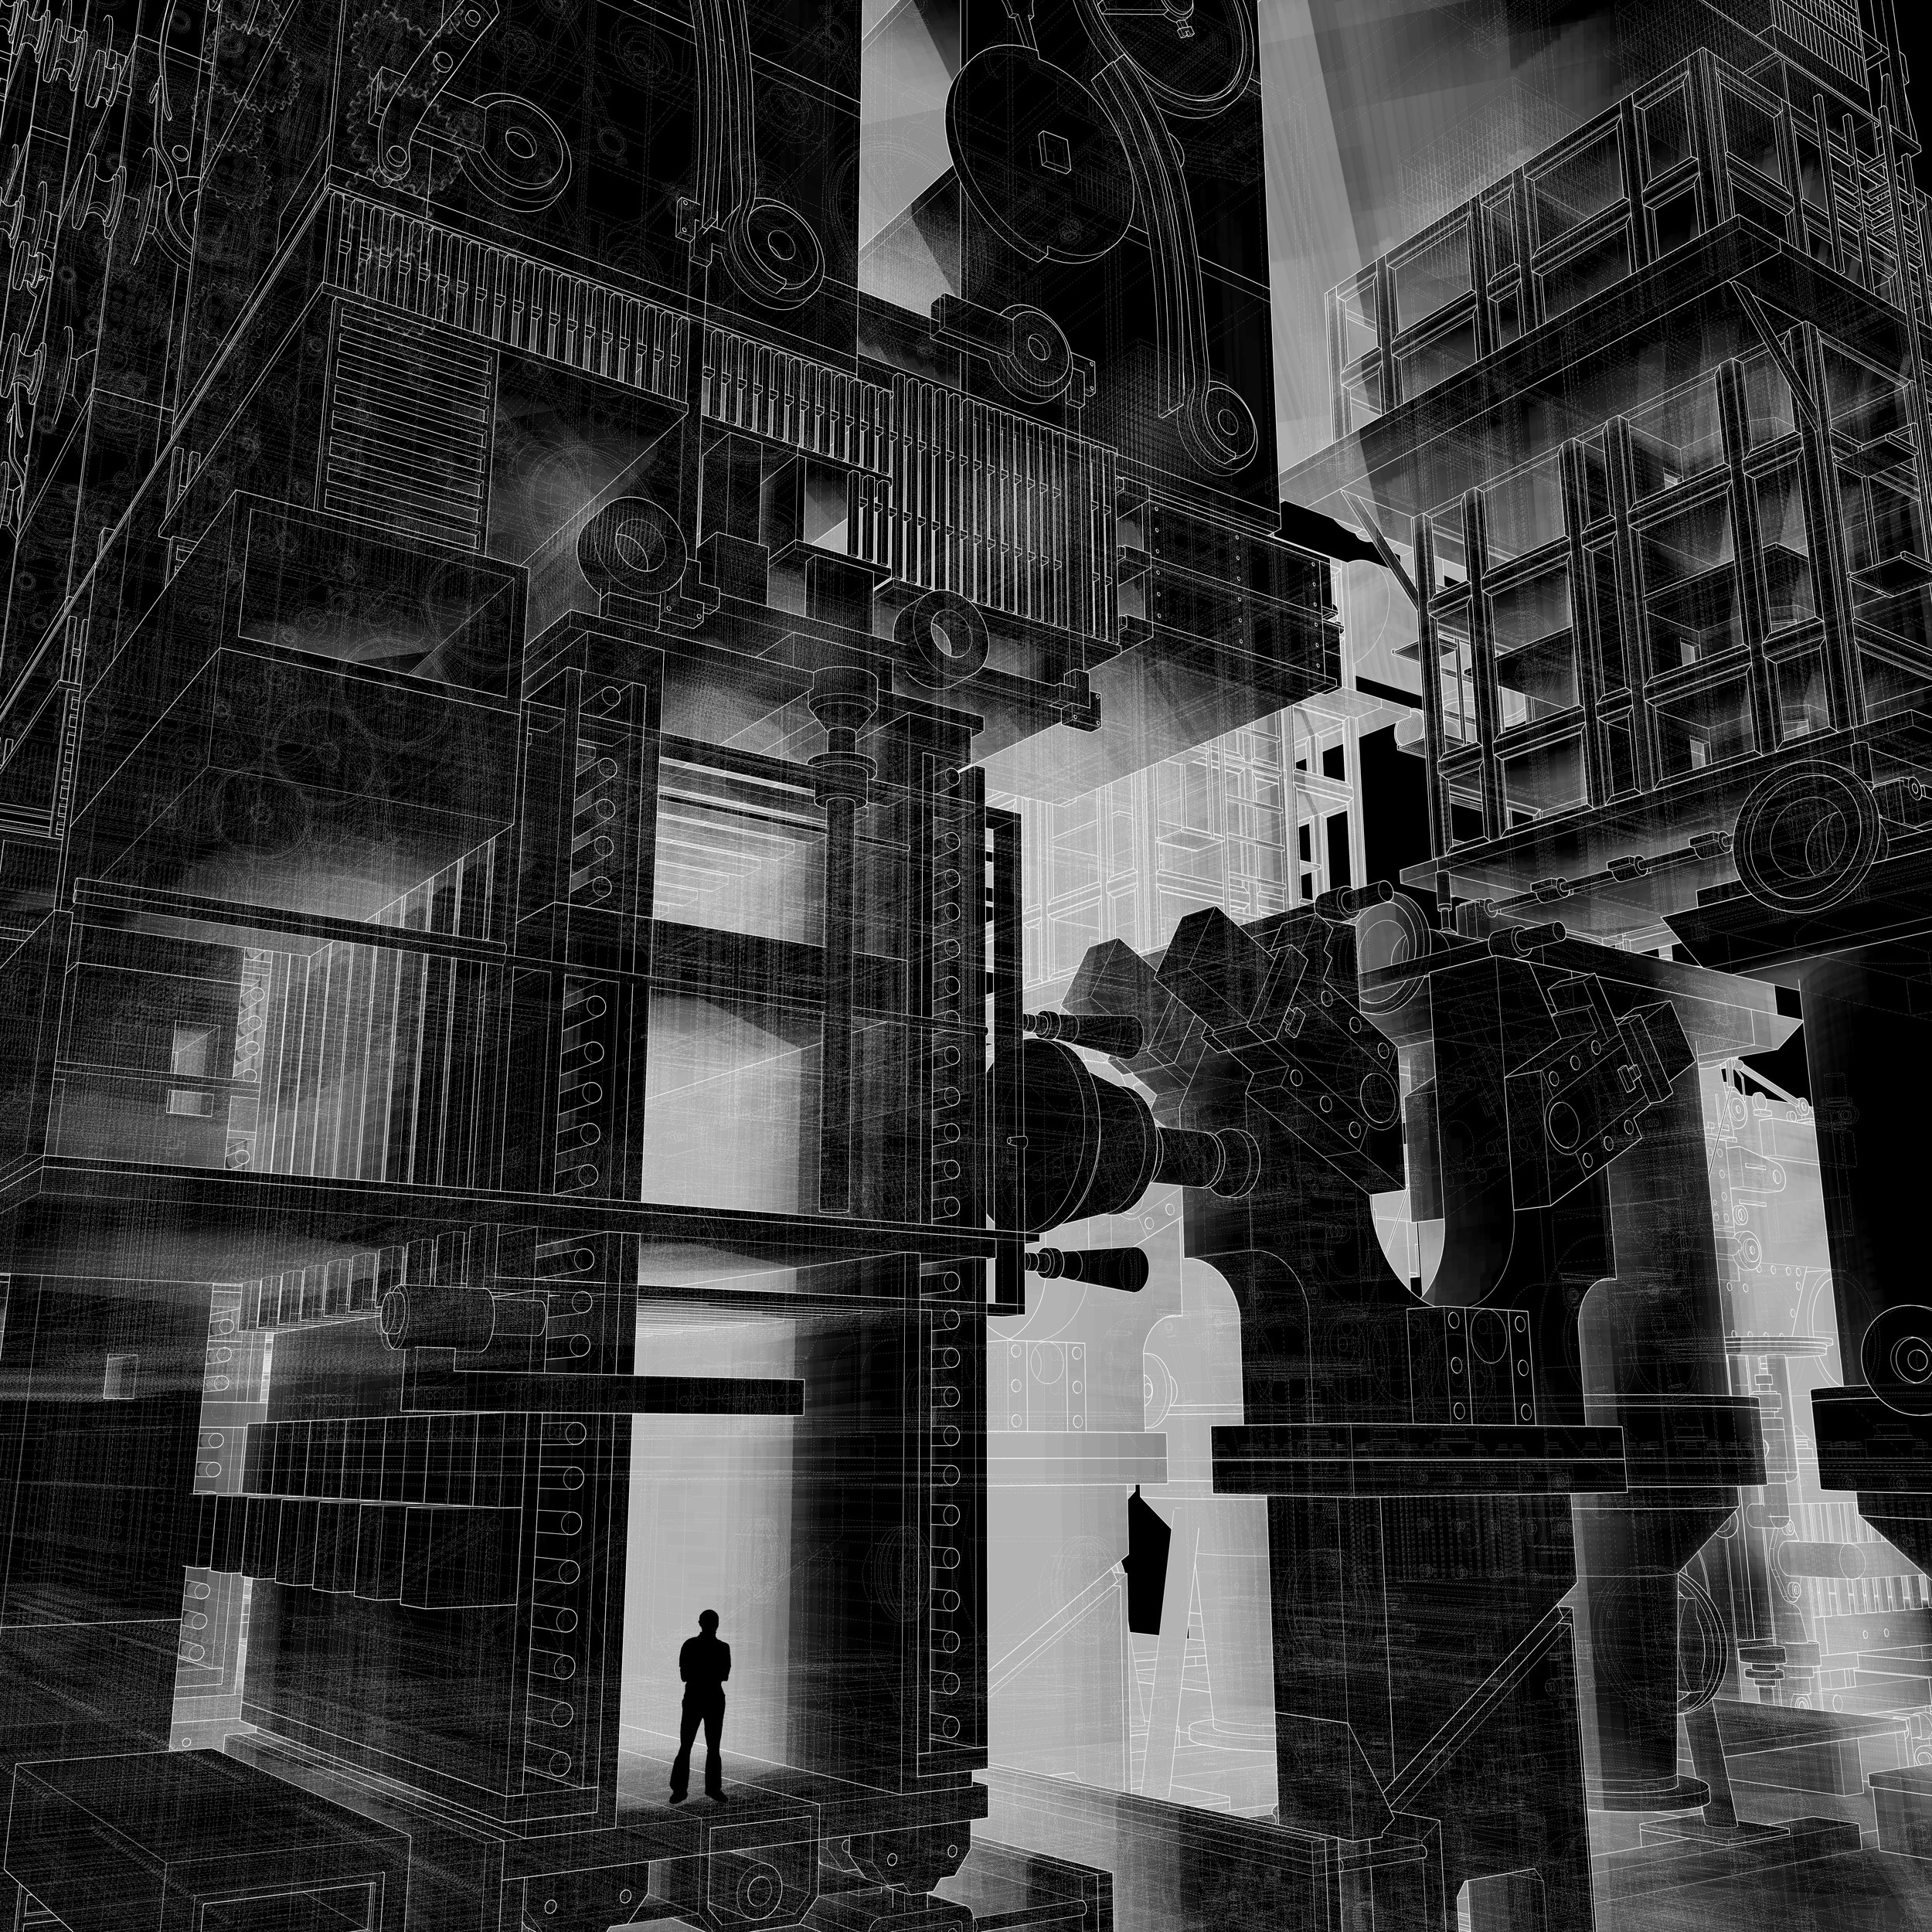 08_Zoom In Perspective.jpg